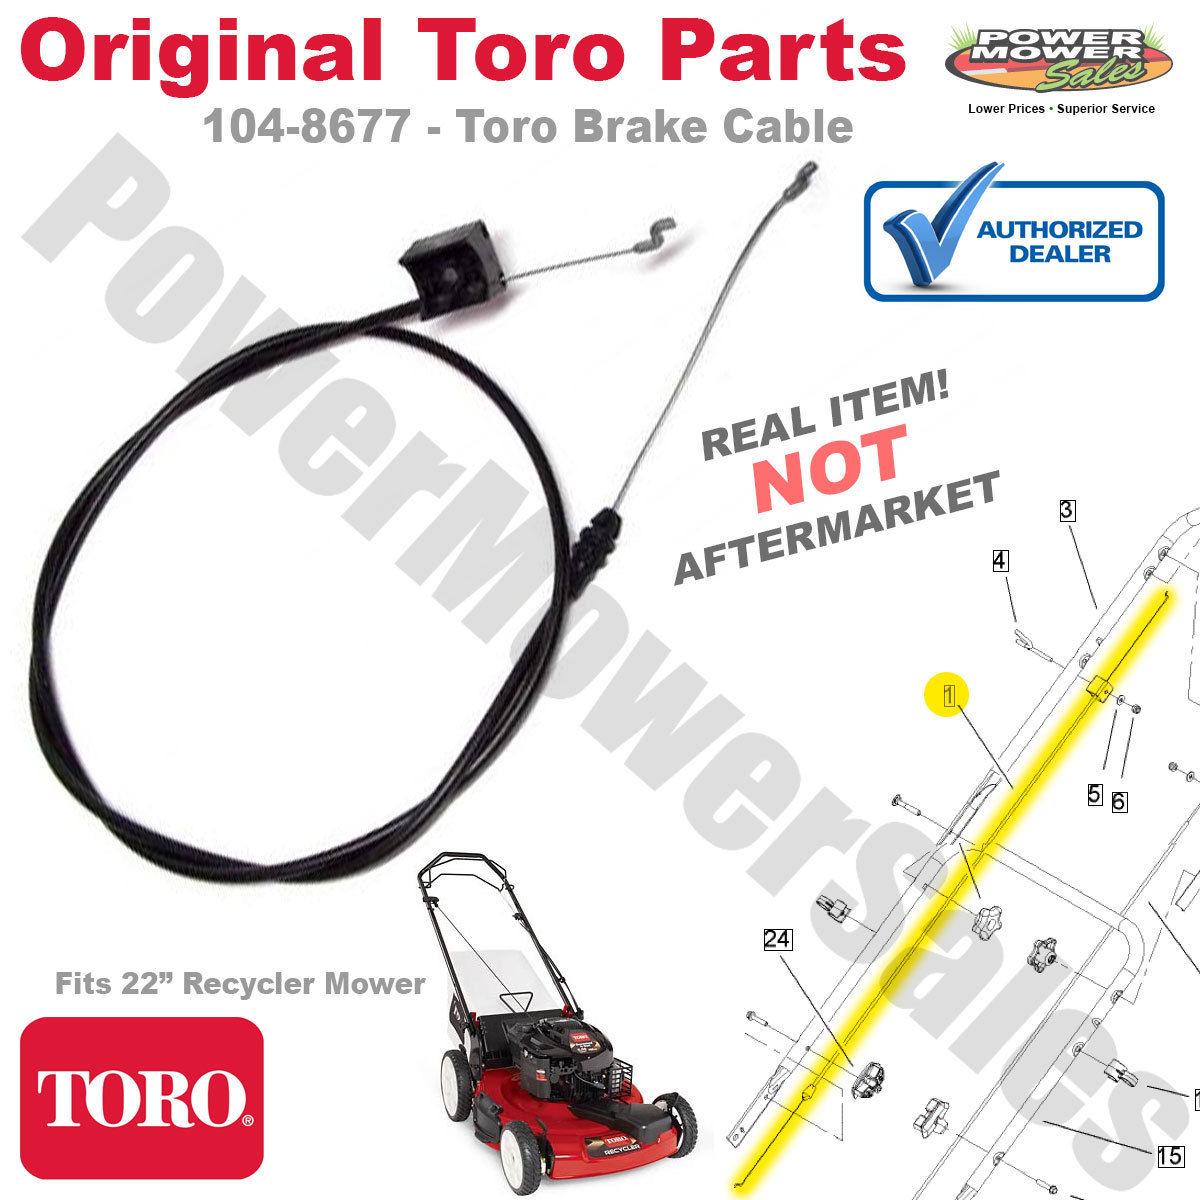 Details about 104-8677 Toro / Lawnboy Lawn mower Brake Cable - Original  Toro Part!!